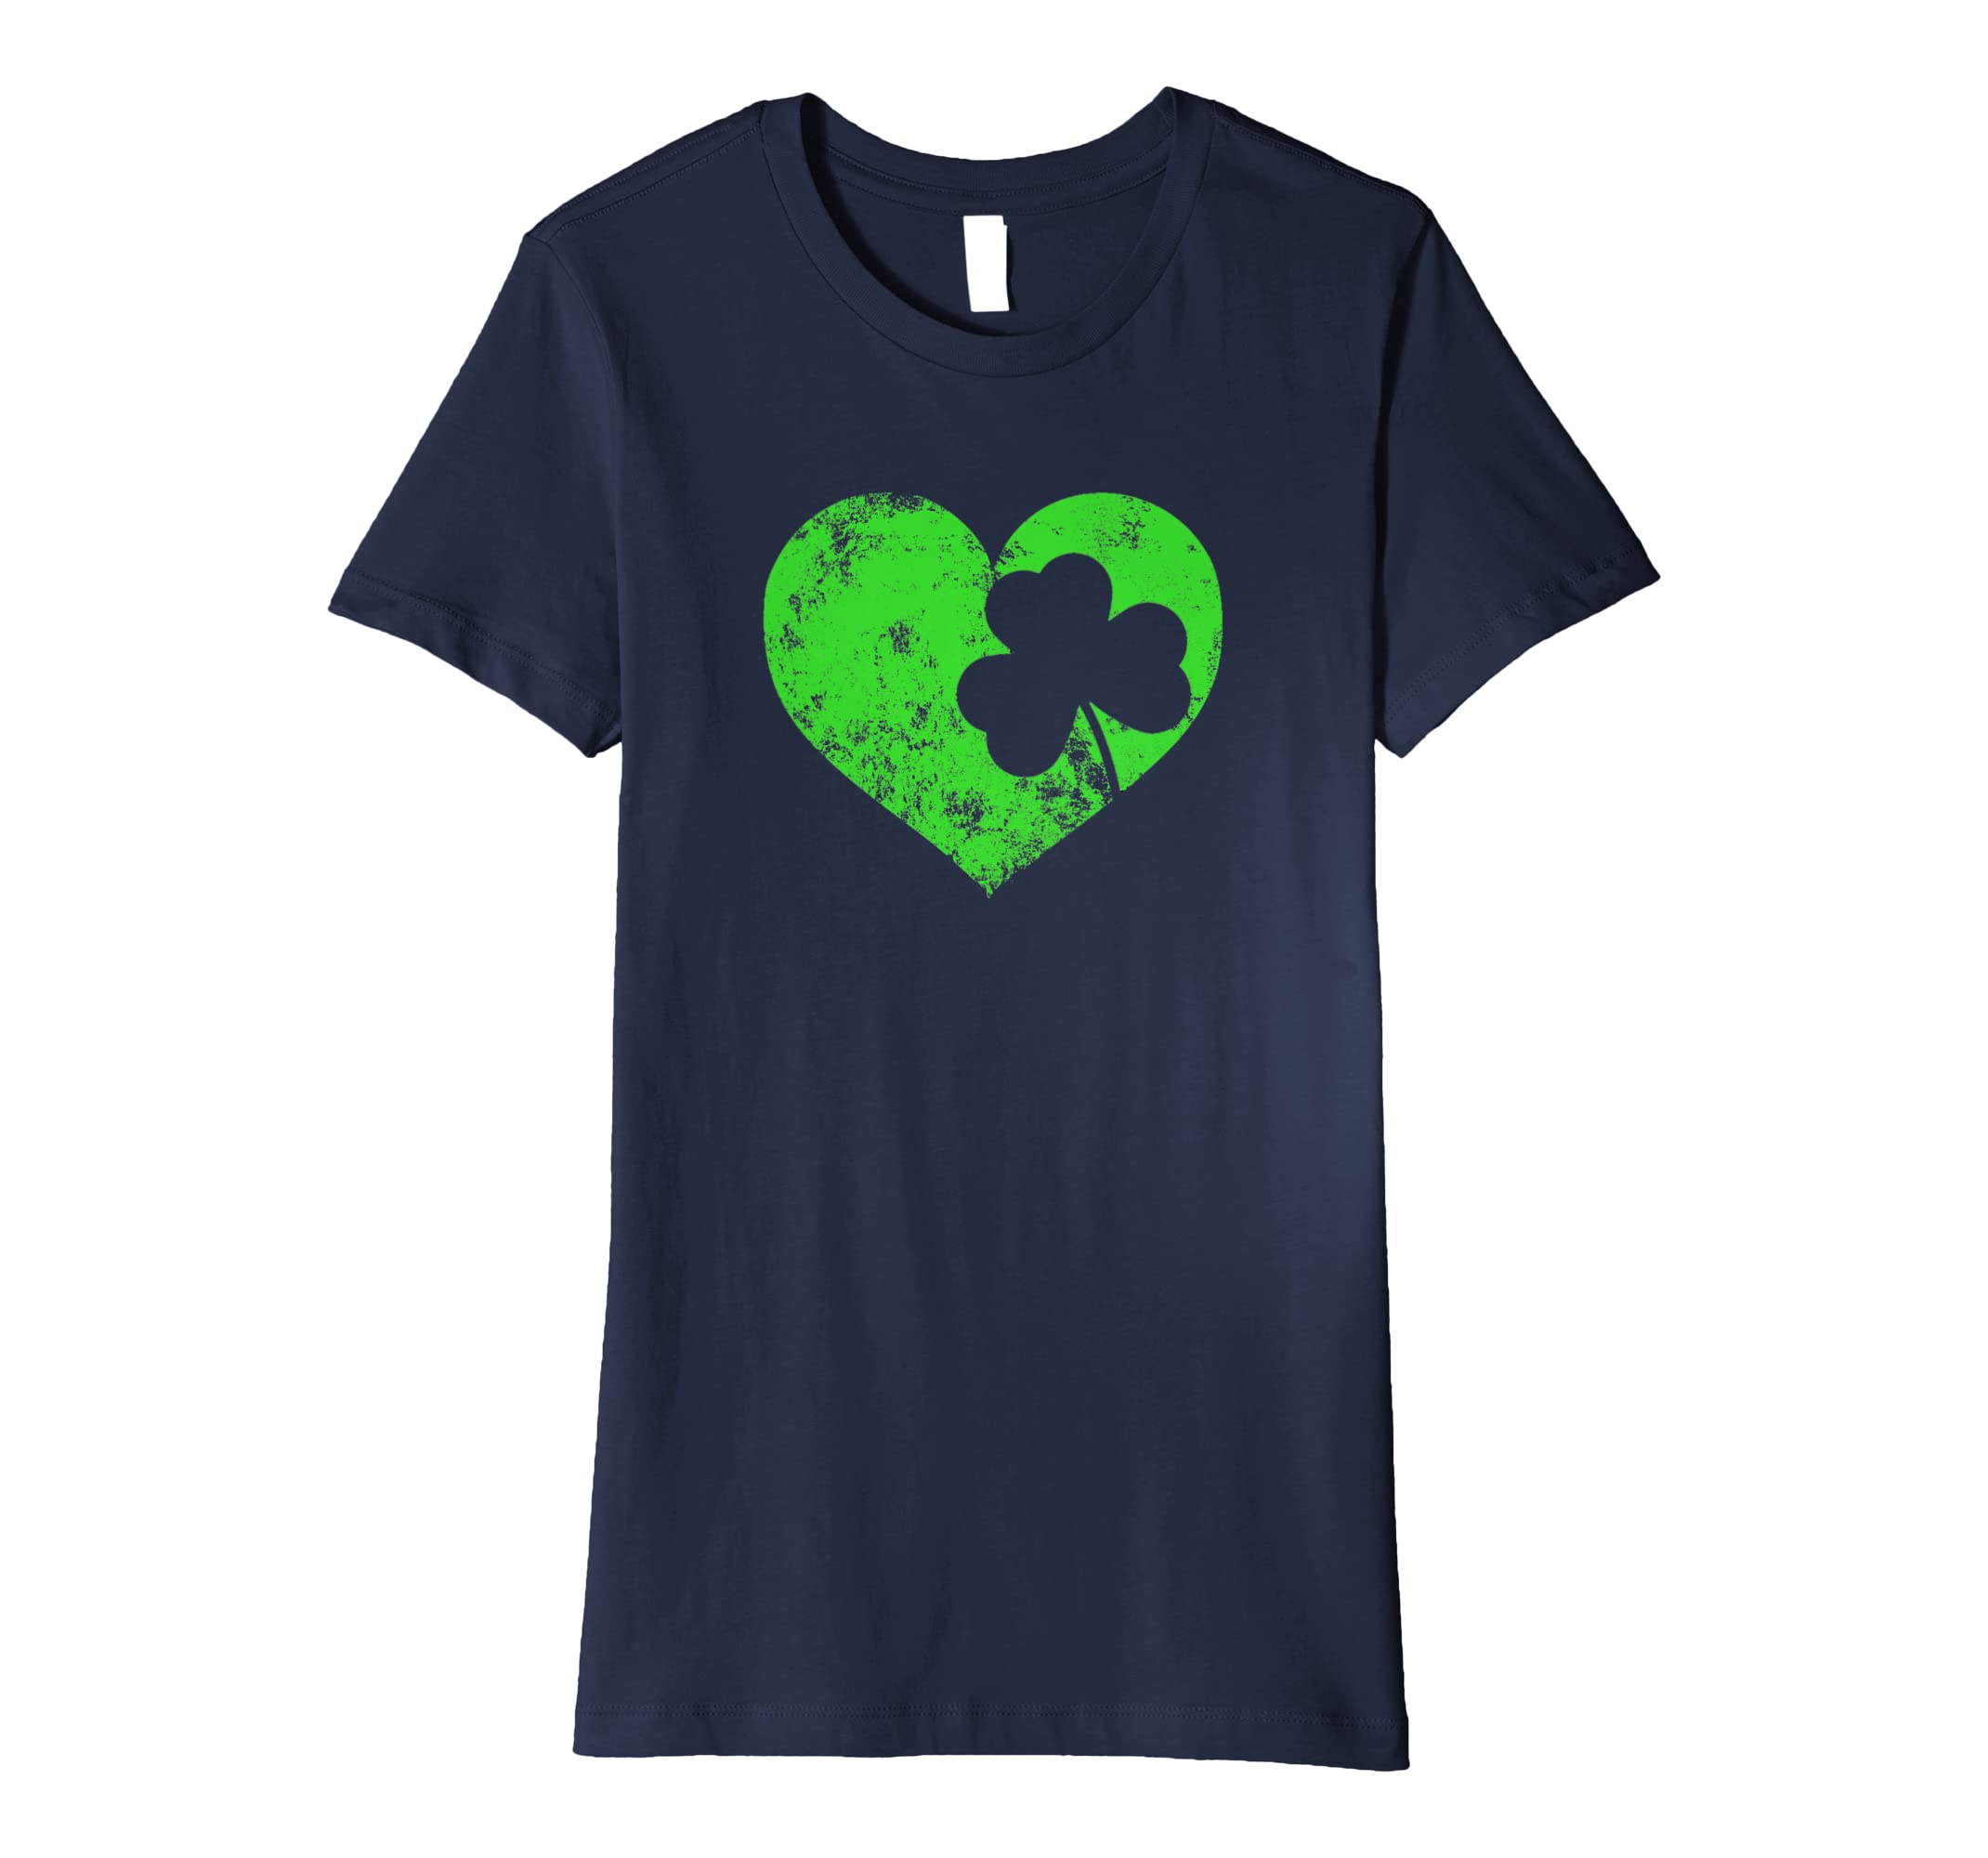 aee1a7935 Amazon.com: I Love St Patrick's Day T-Shirt Cute Heart Shamrock Top Tee:  Clothing